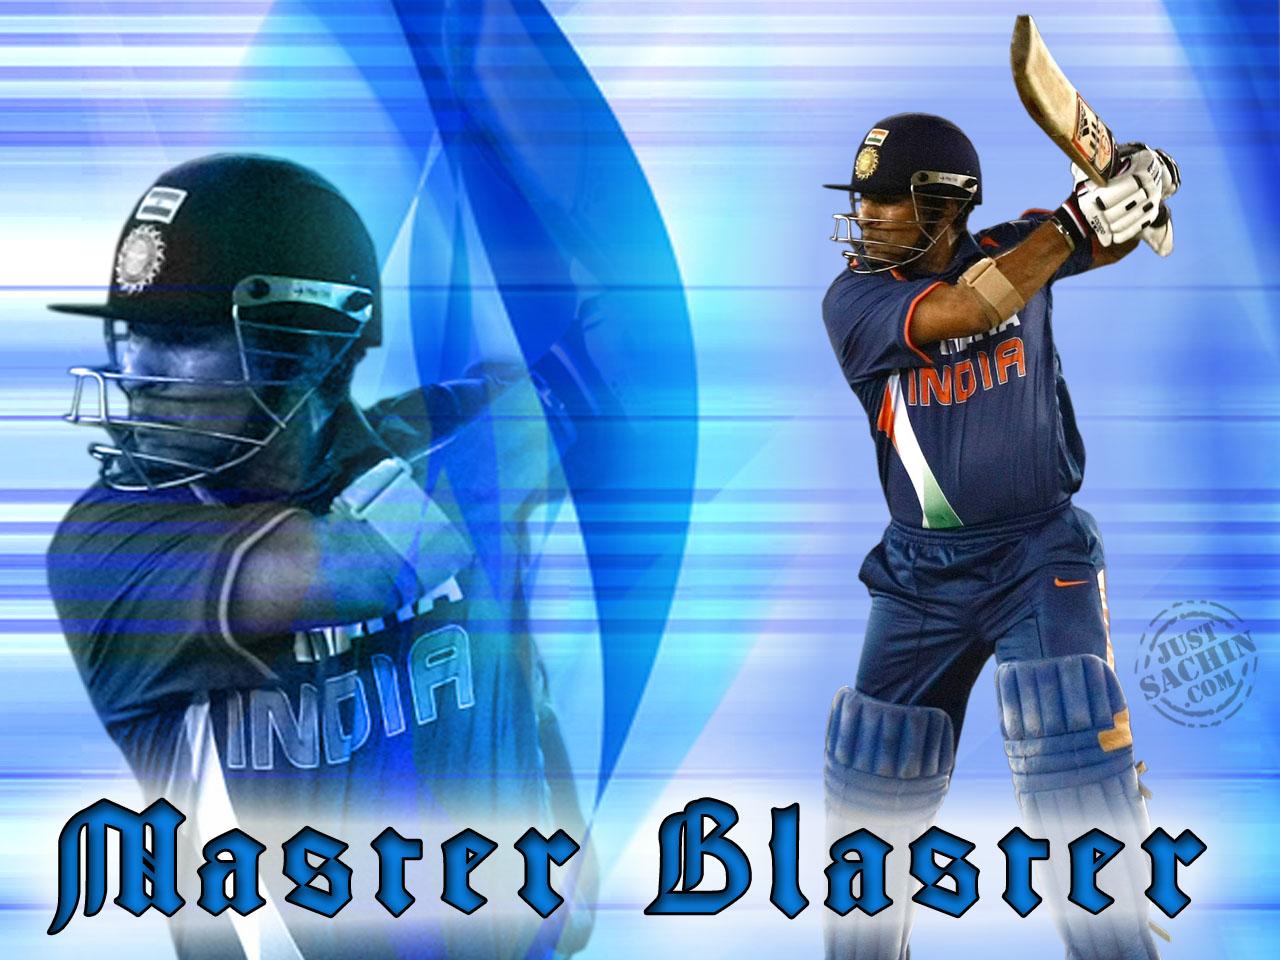 sachin tendulkar wallpaper amp pictures cricketers wallpapers